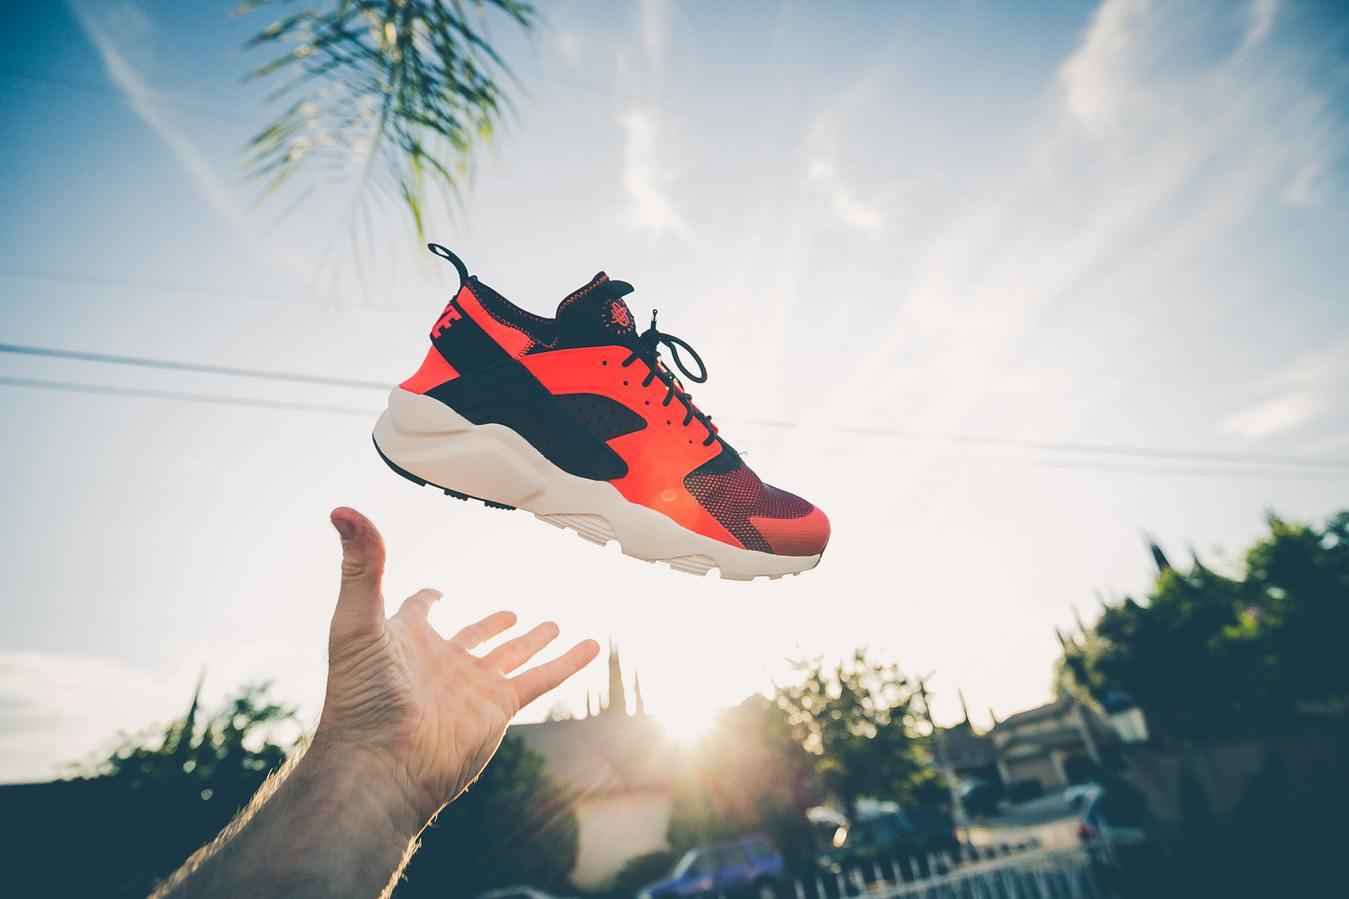 Rode sneaker in lucht gegooid